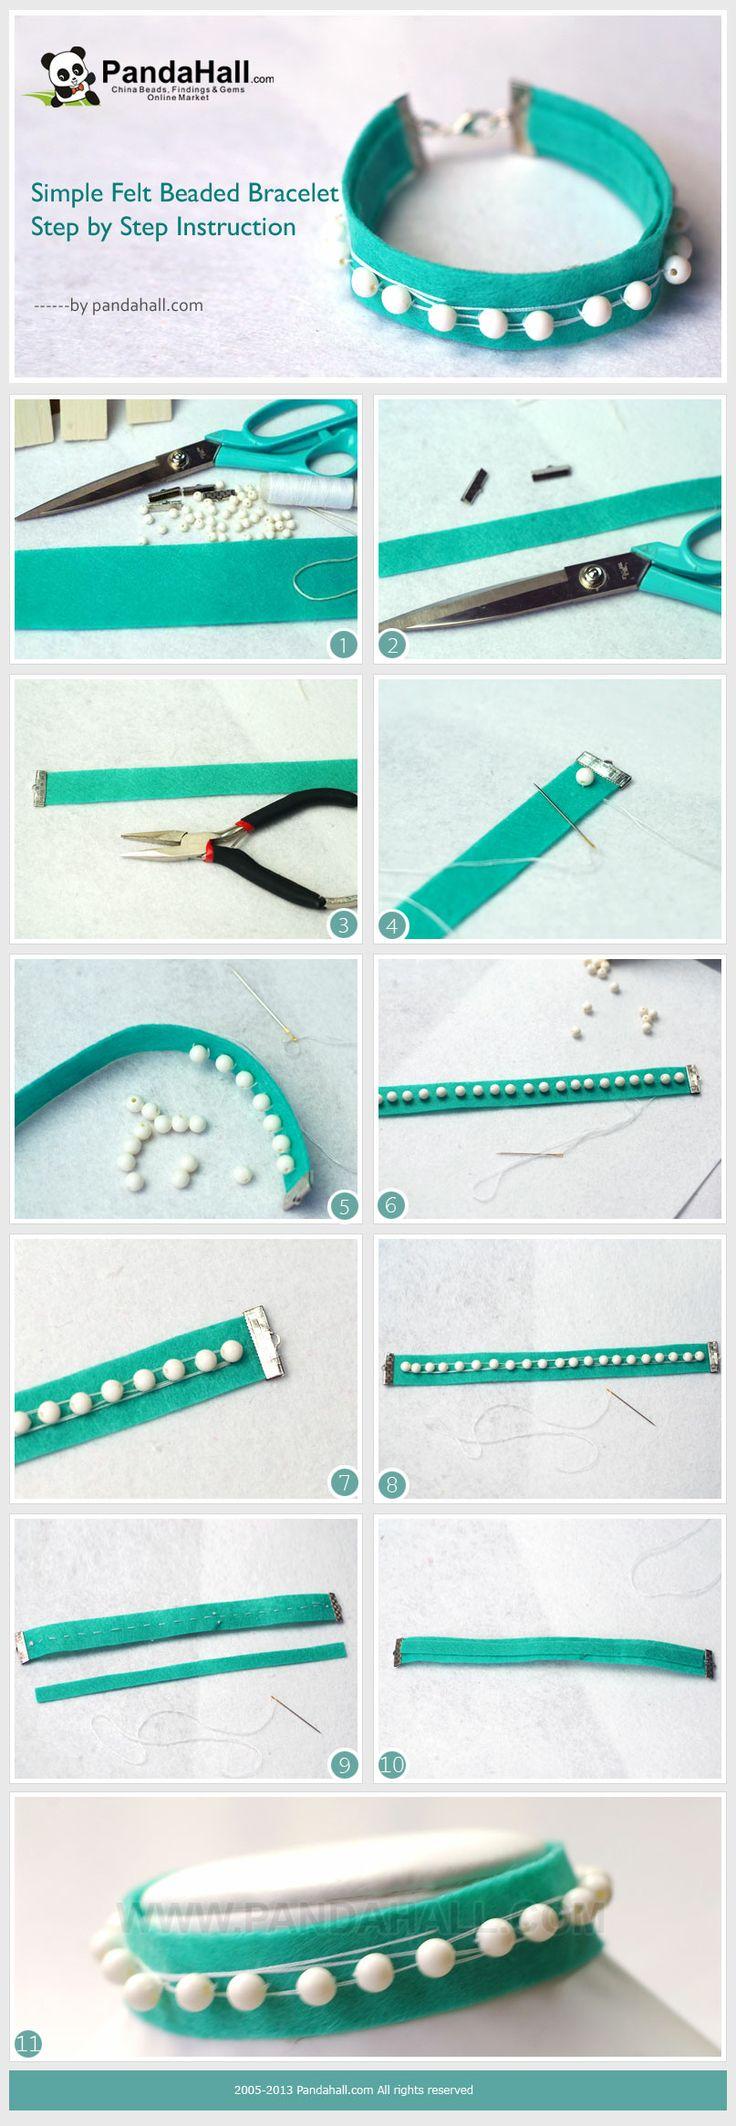 Simple Felt Beaded Bracelet Step by Step Instruction